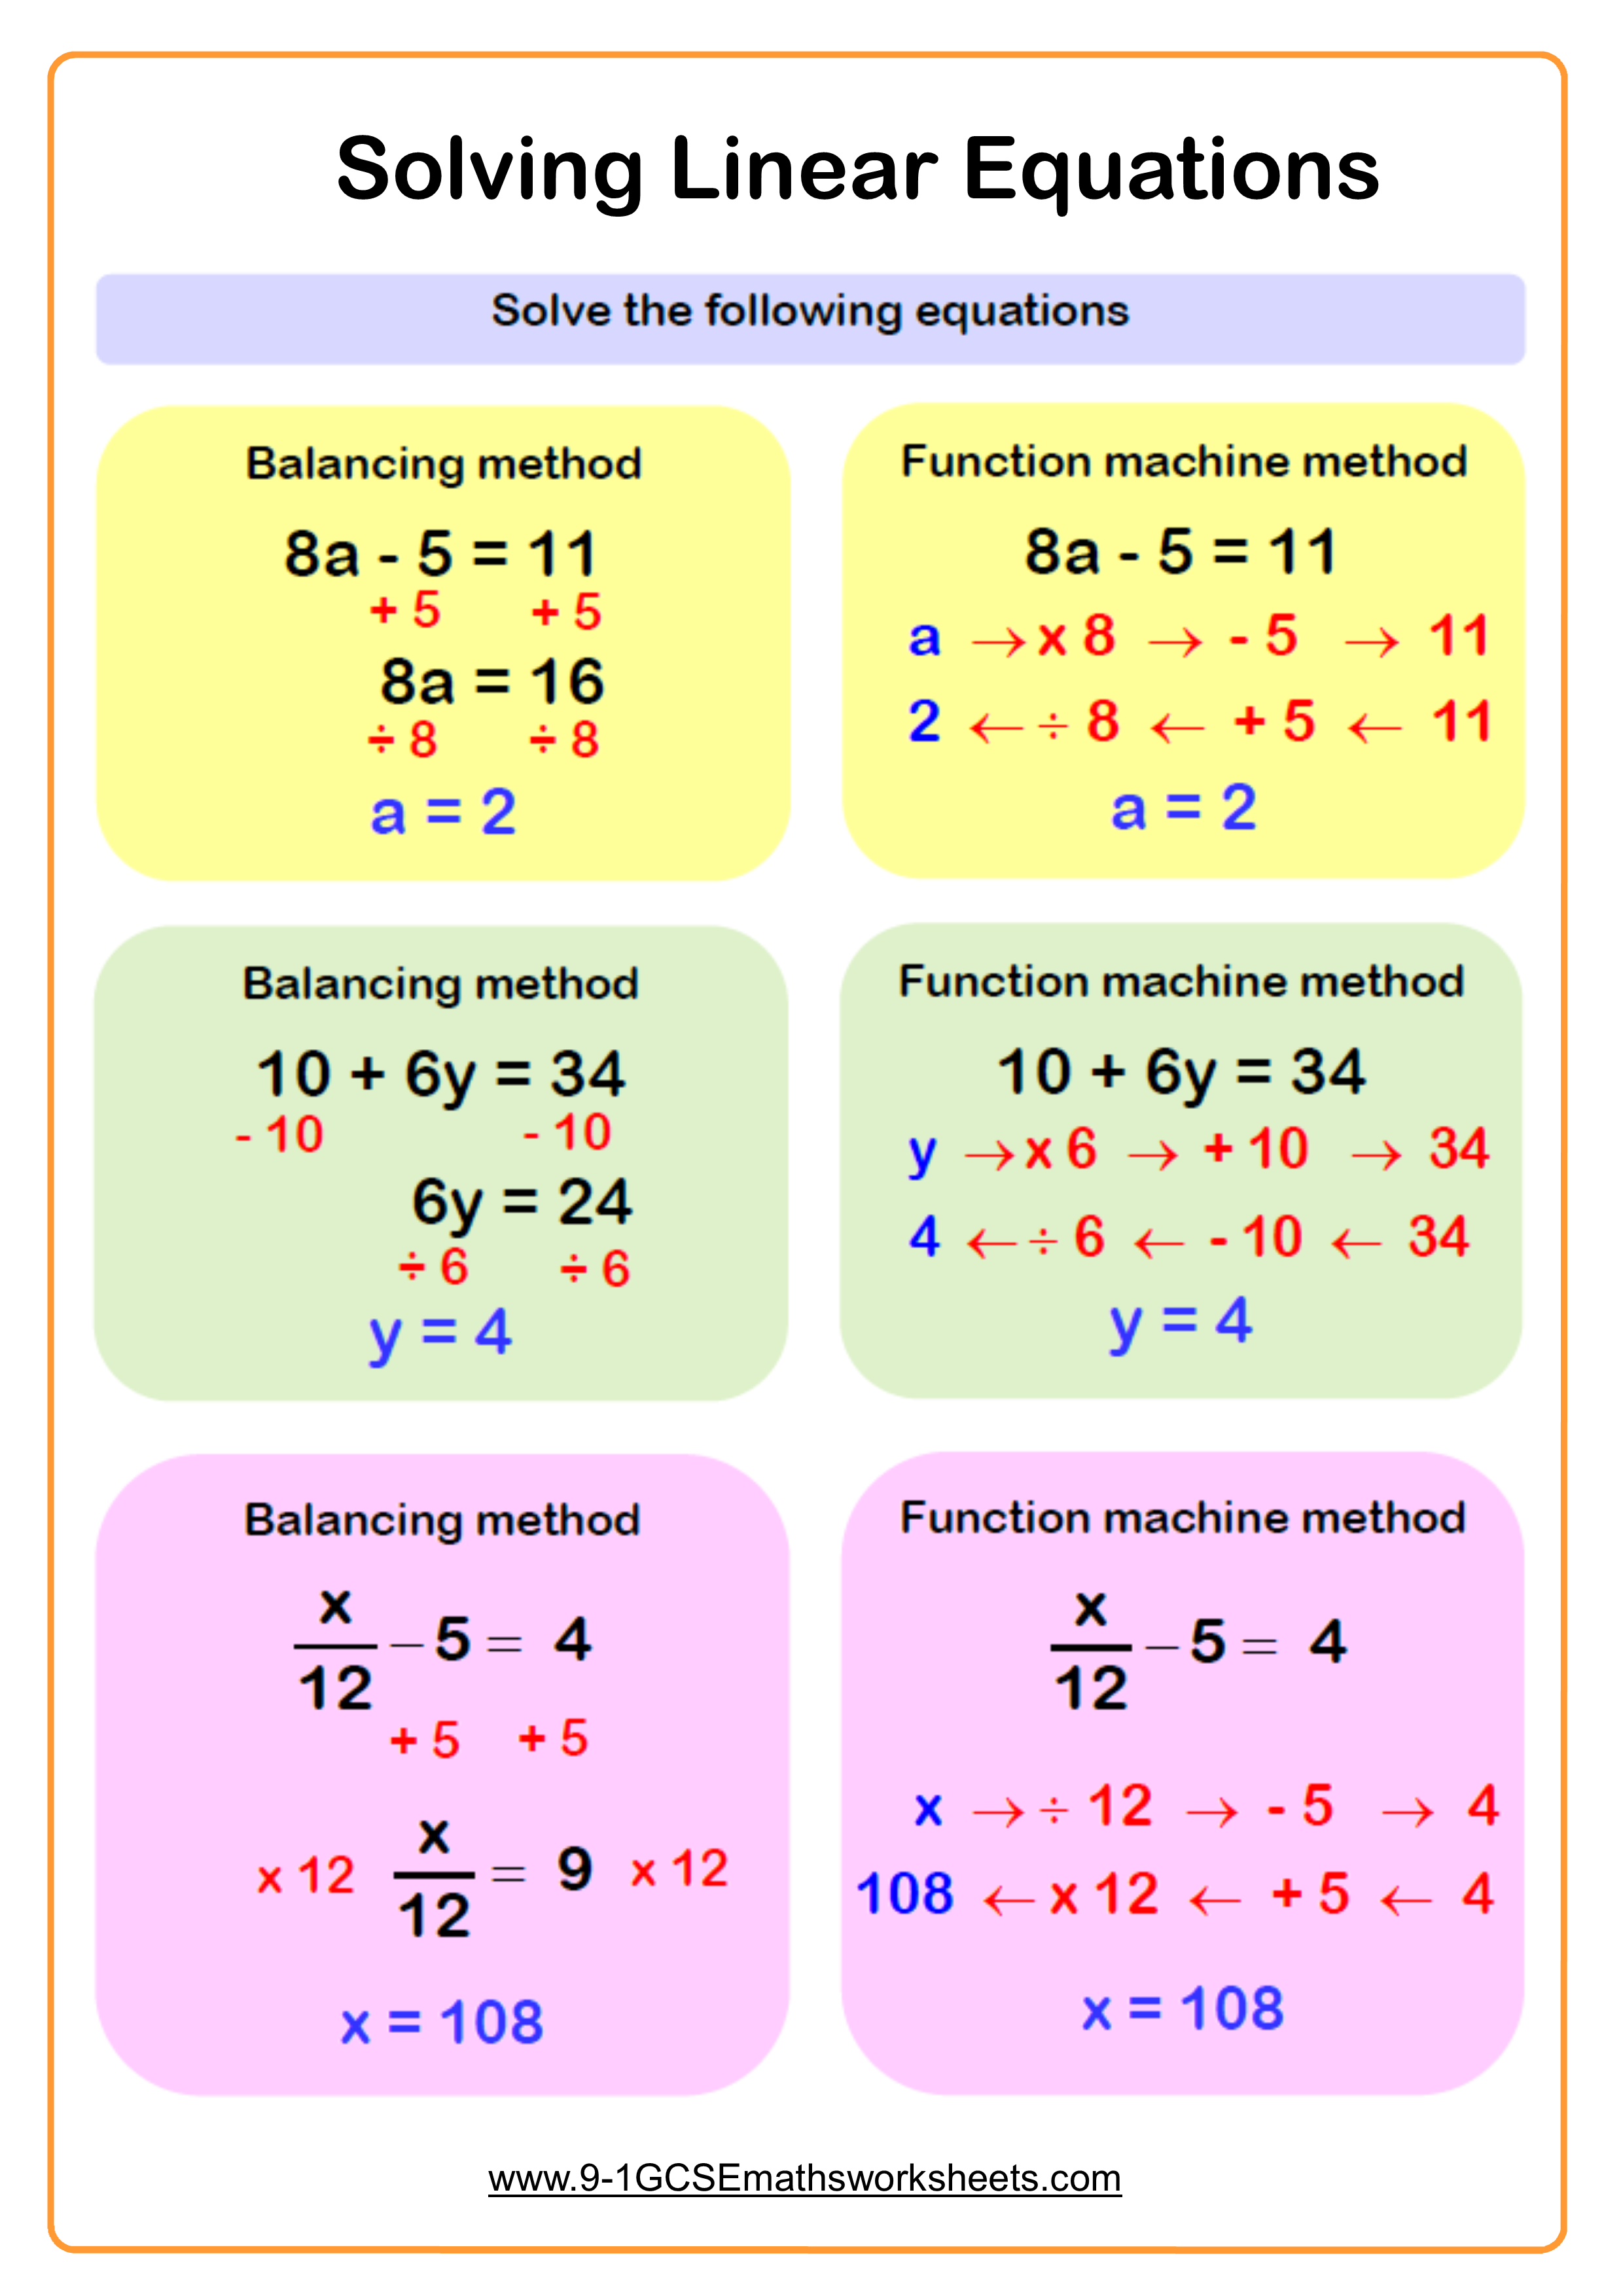 Solving Equations Worksheets Cazoom Maths Worksheets Solving Linear Equations School Algebra Algebra Worksheets